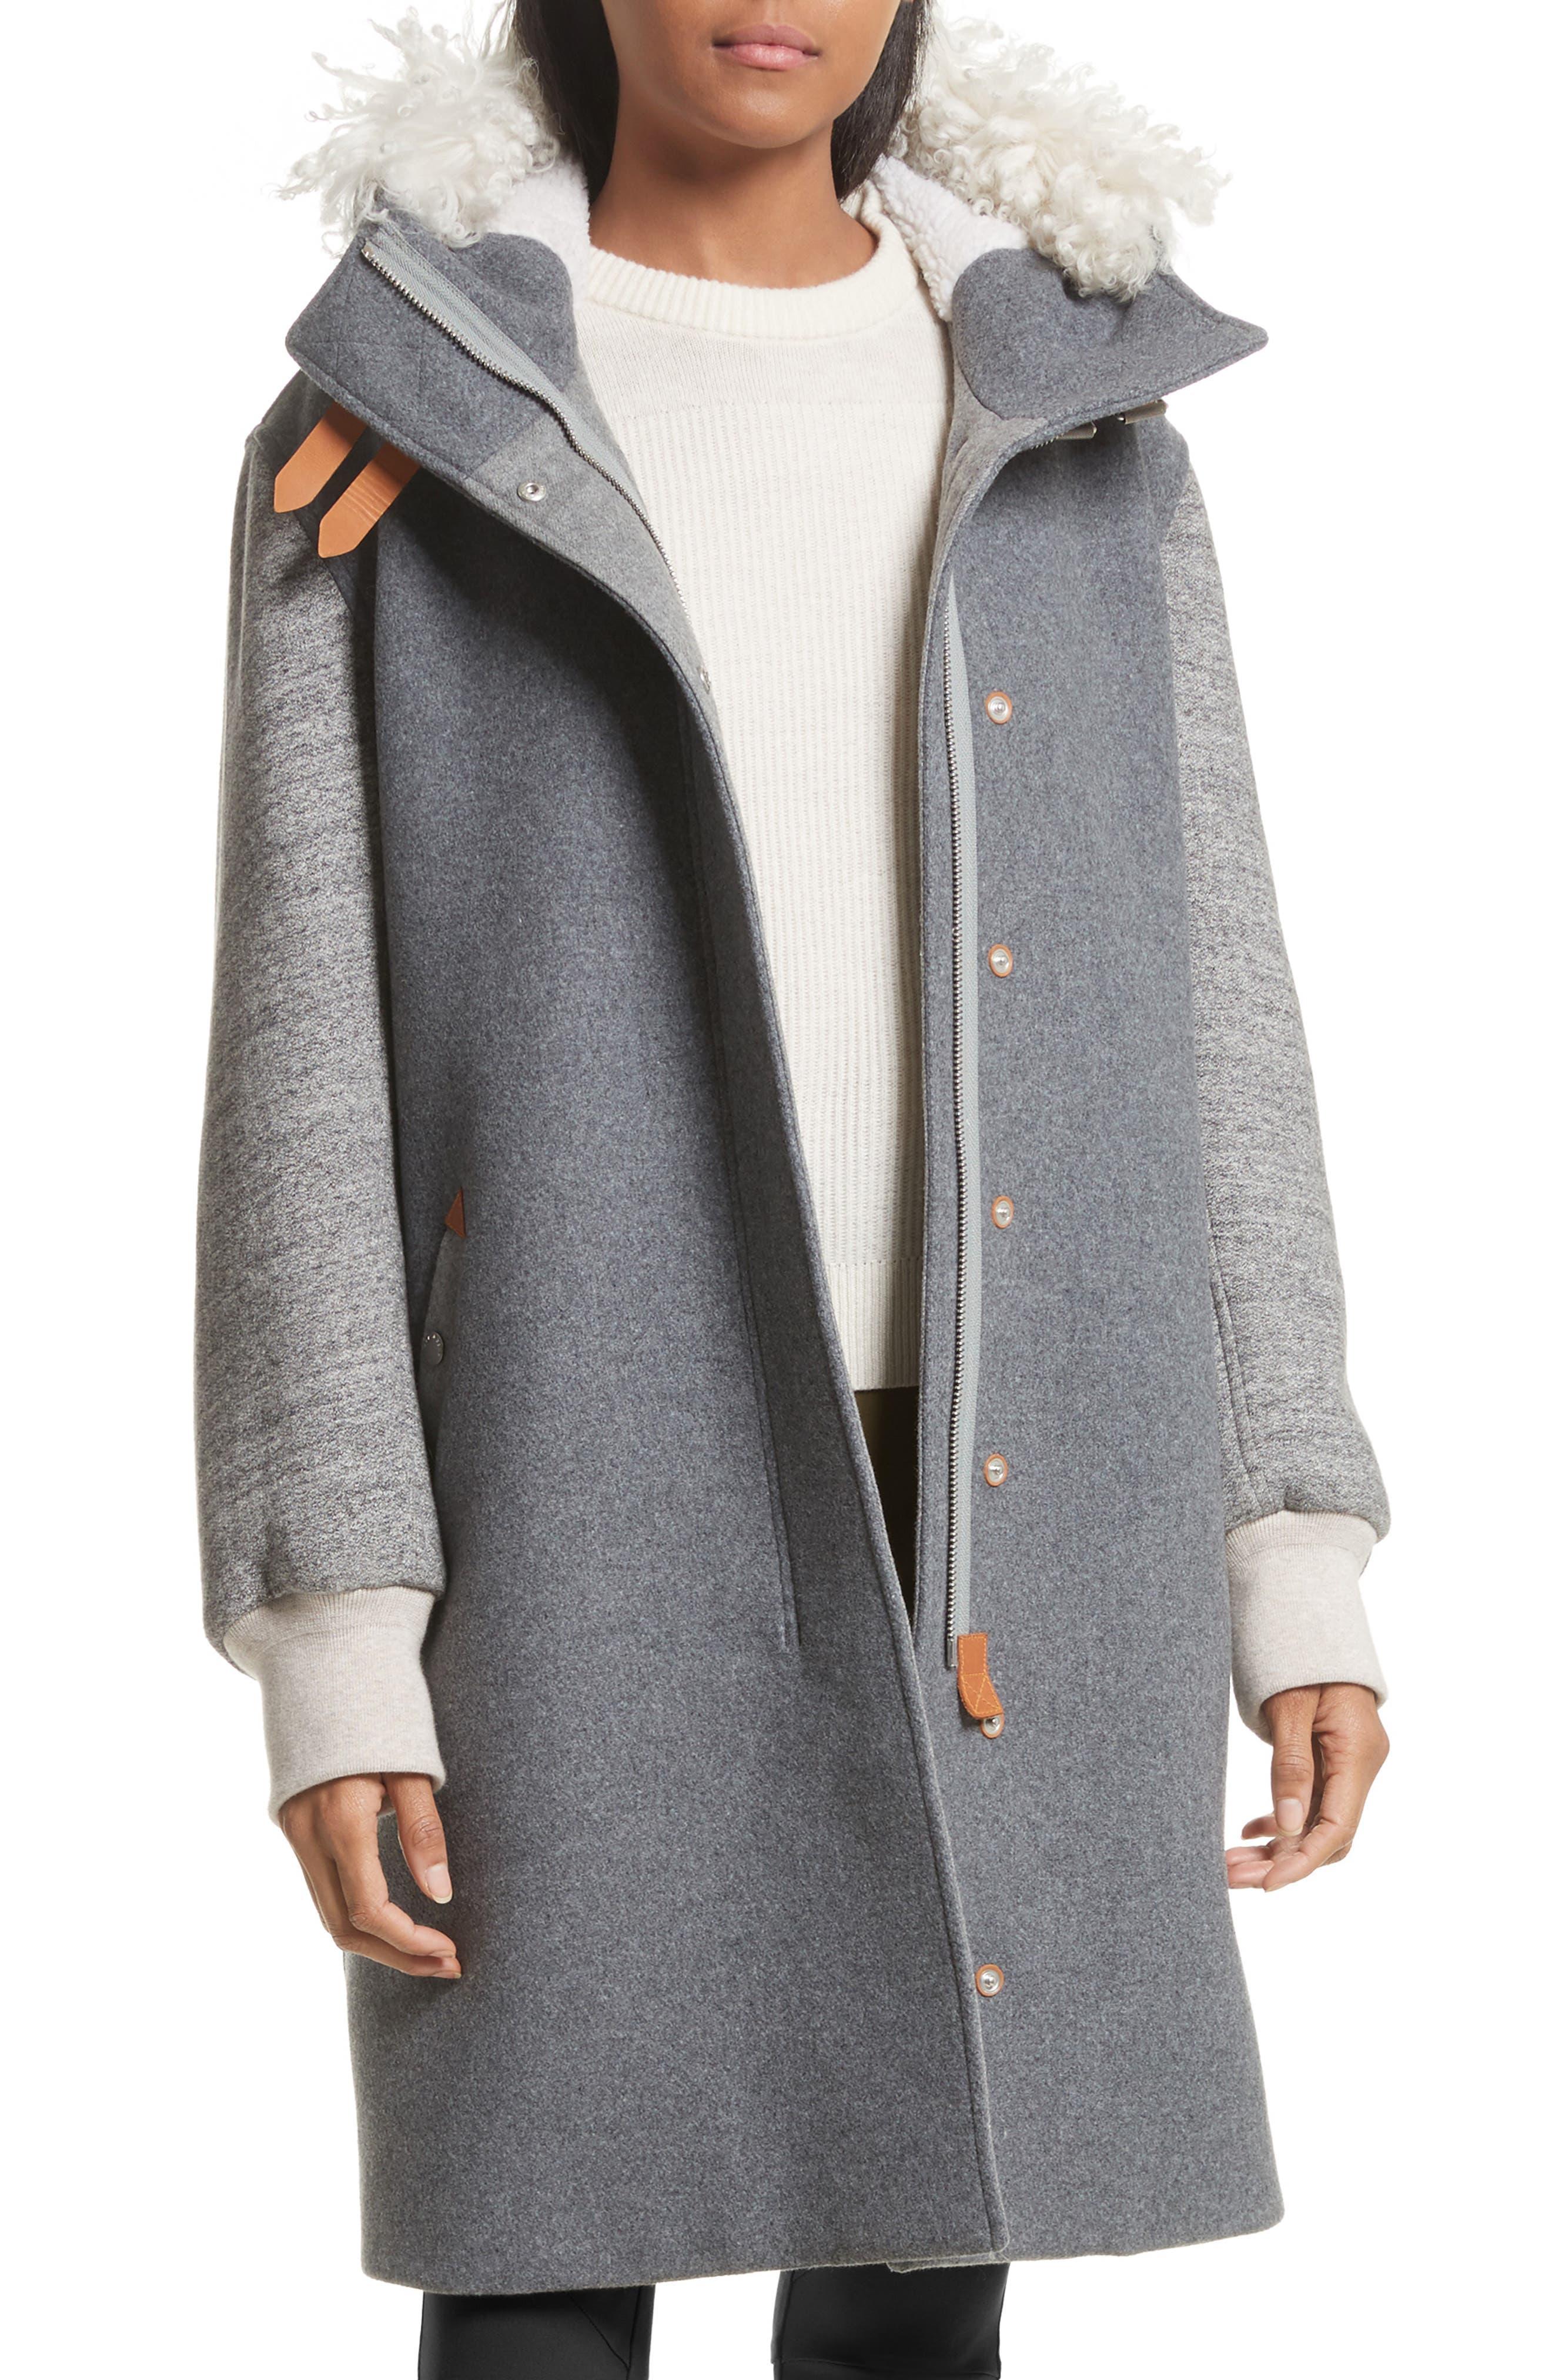 Main Image - rag & bone Laporta Genuine Shearling Trim Wool Blend Hooded Coat